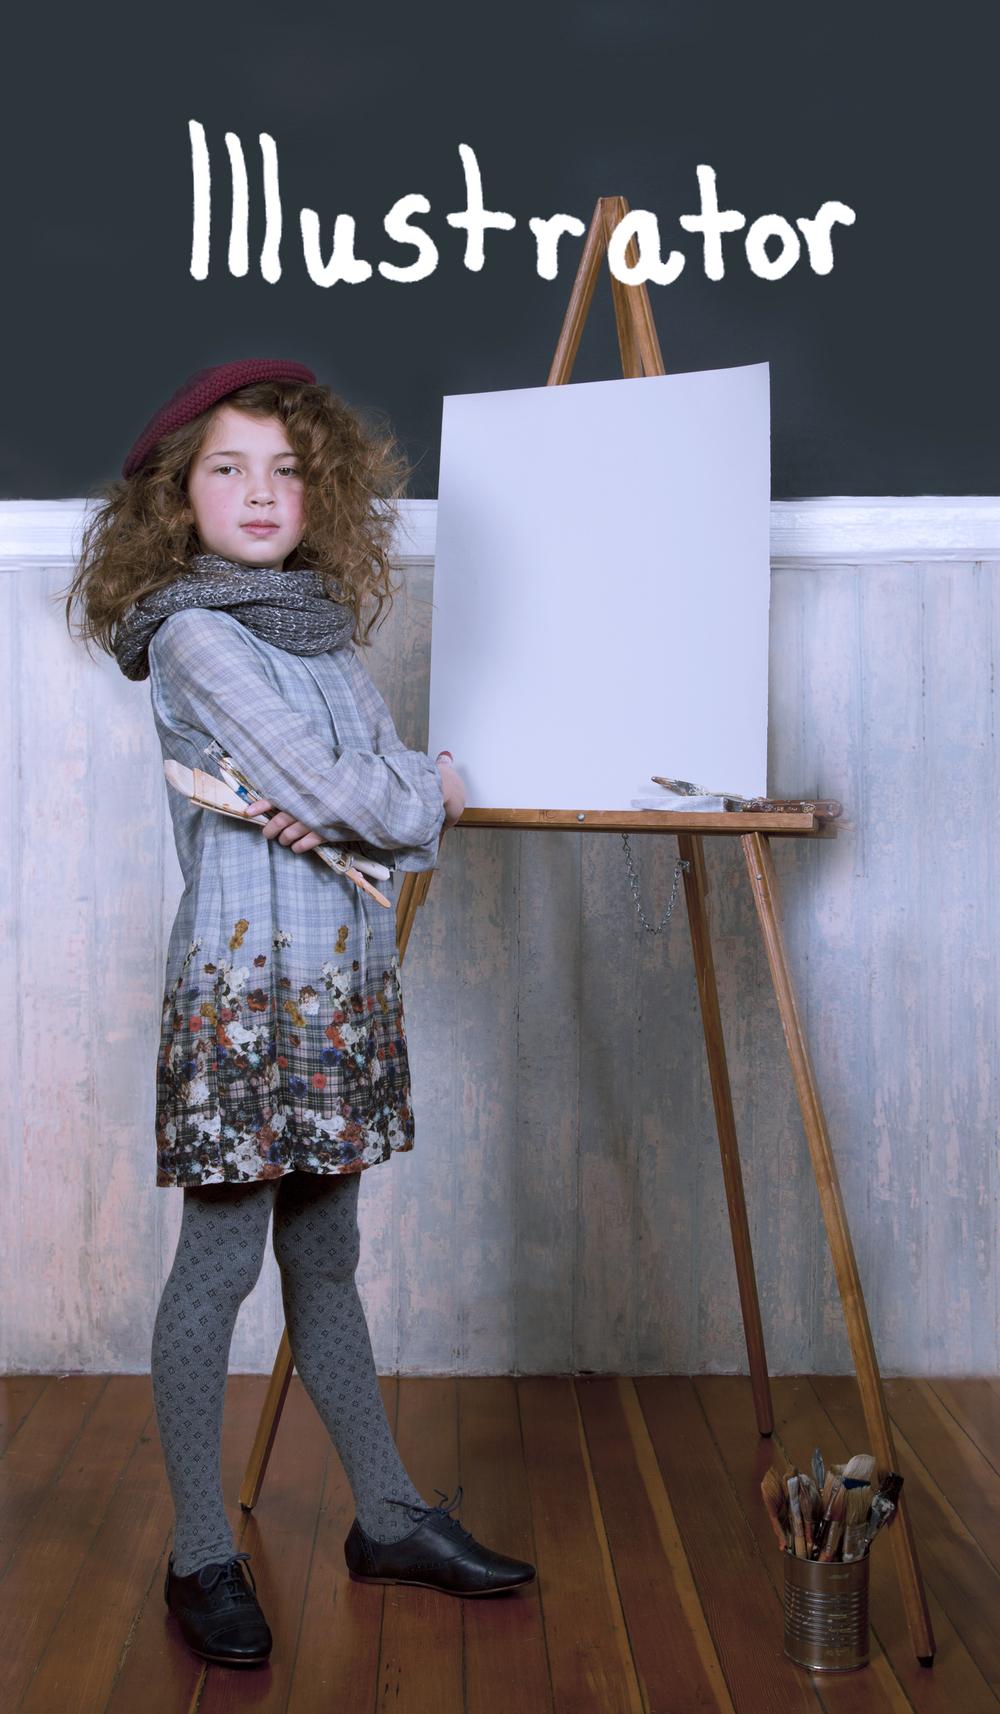 illustrator.jpg